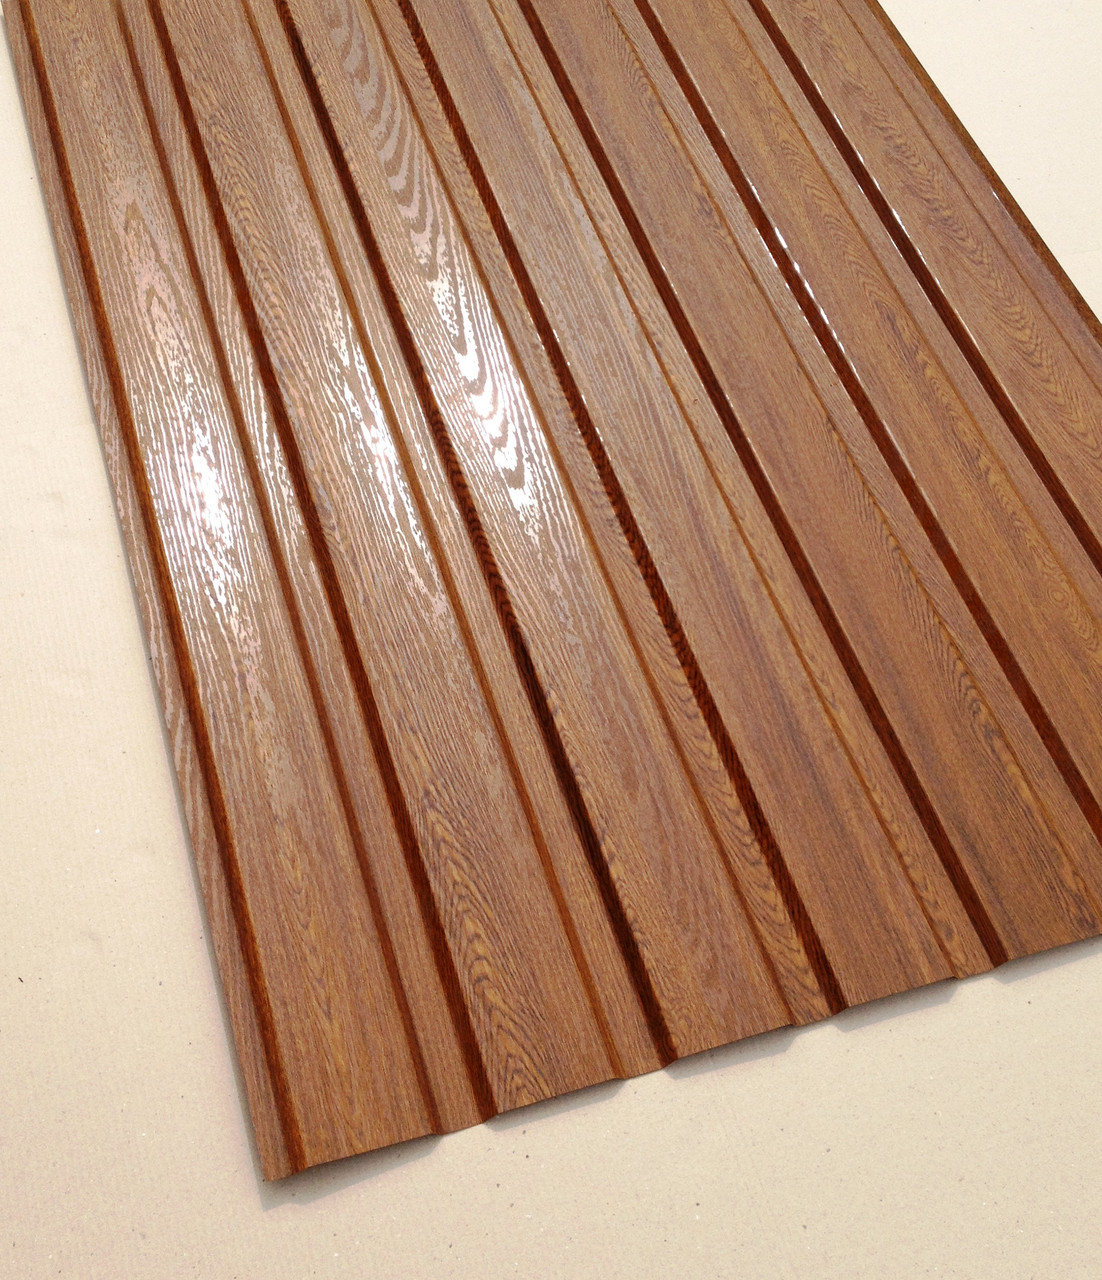 Профнастил с объемным рисунком  дерева Дуб 3D wood18DARK/8003, размер листа 1,5Х1,16м